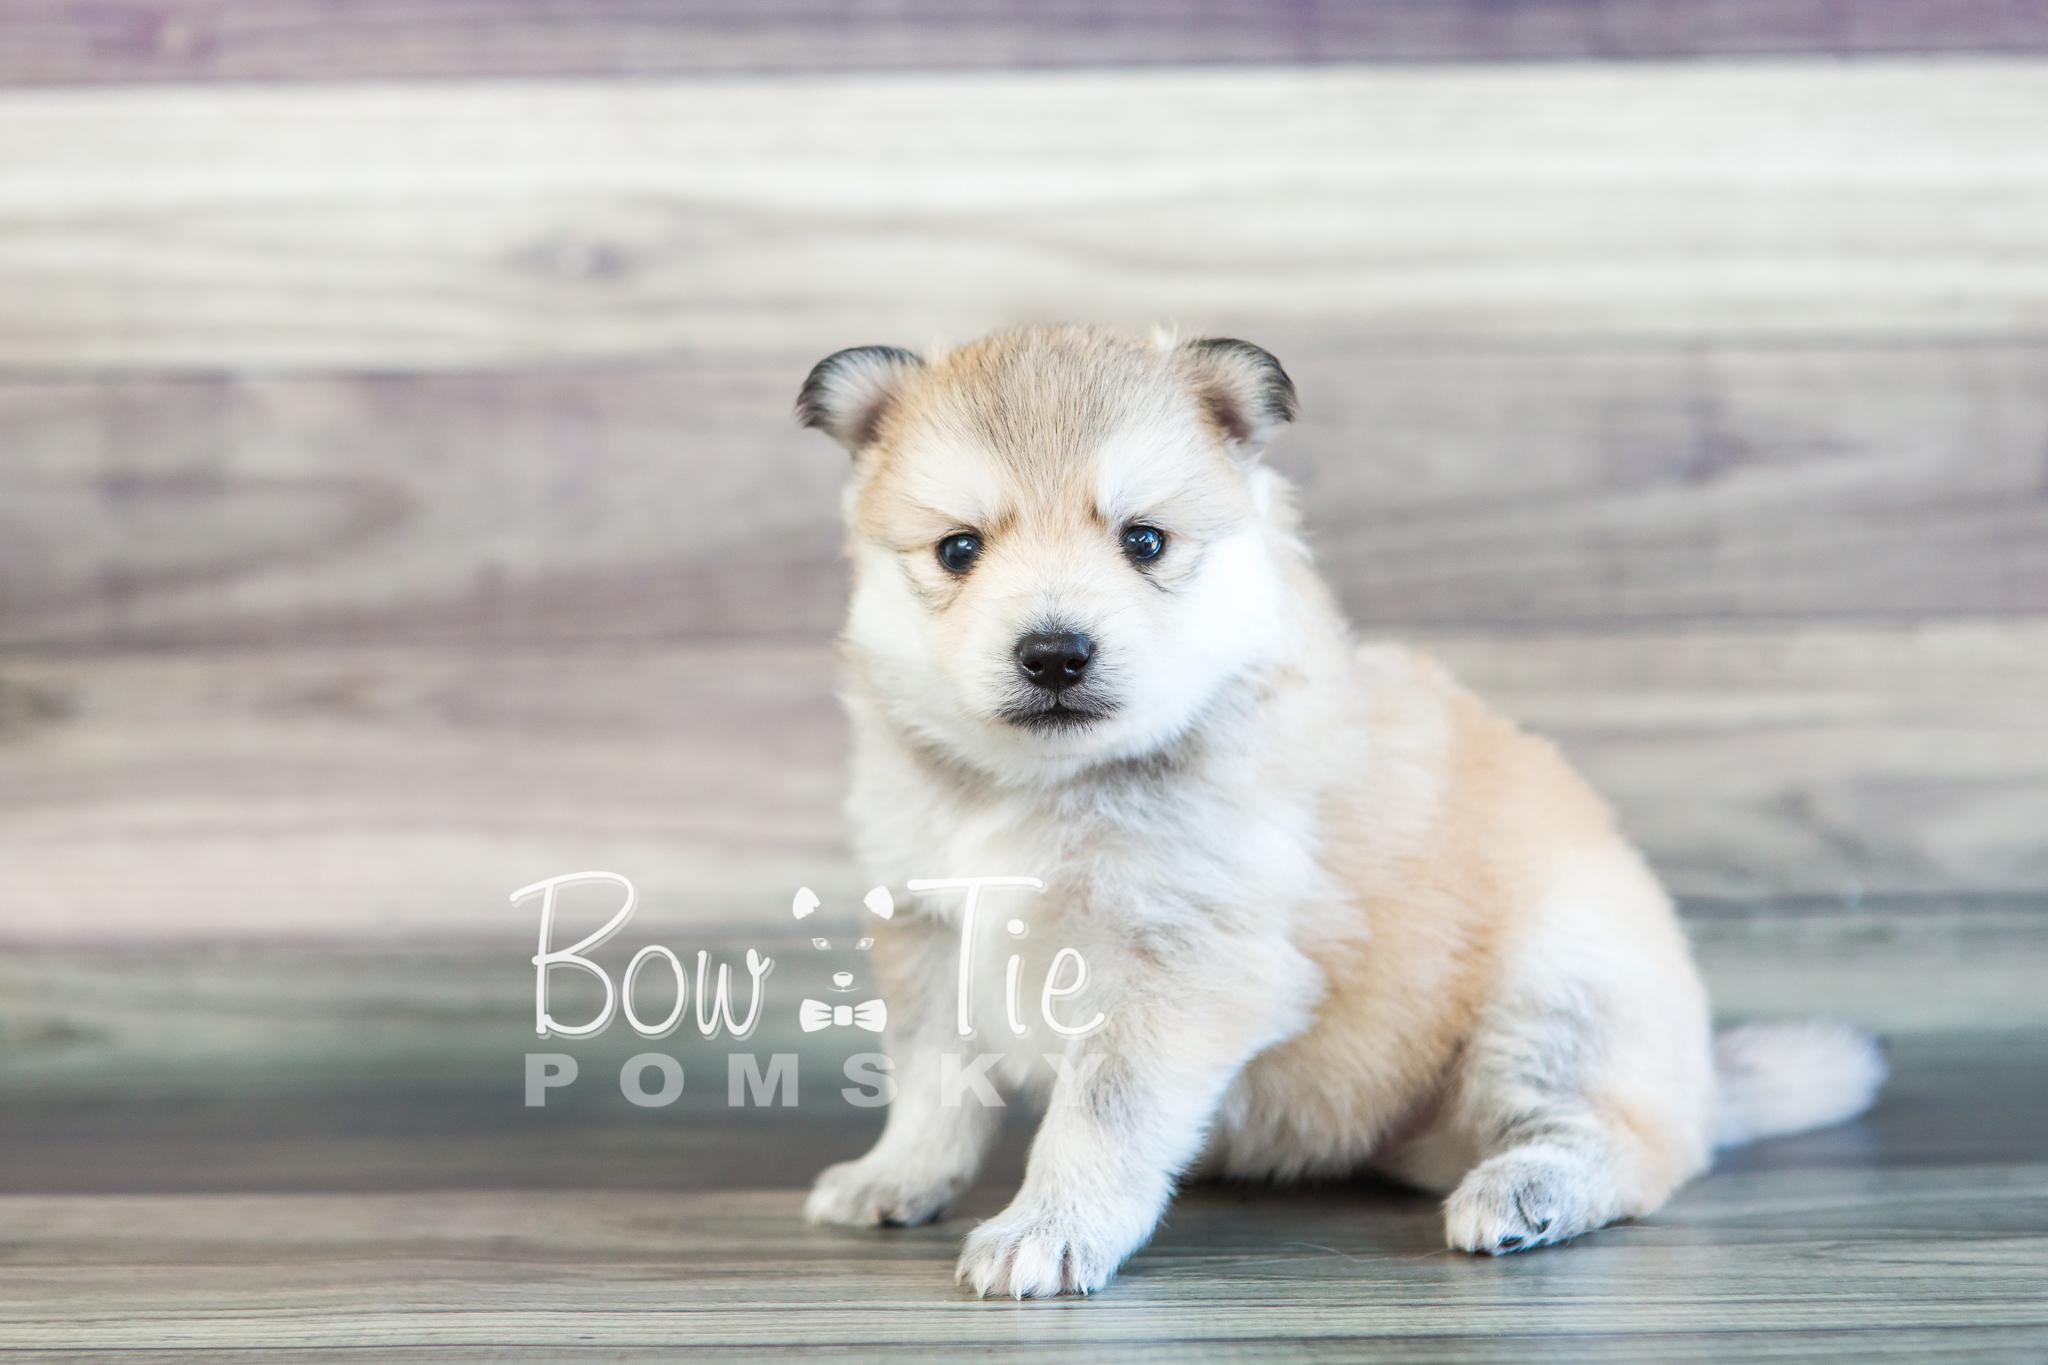 Mini Pomsky Dog Ecosia